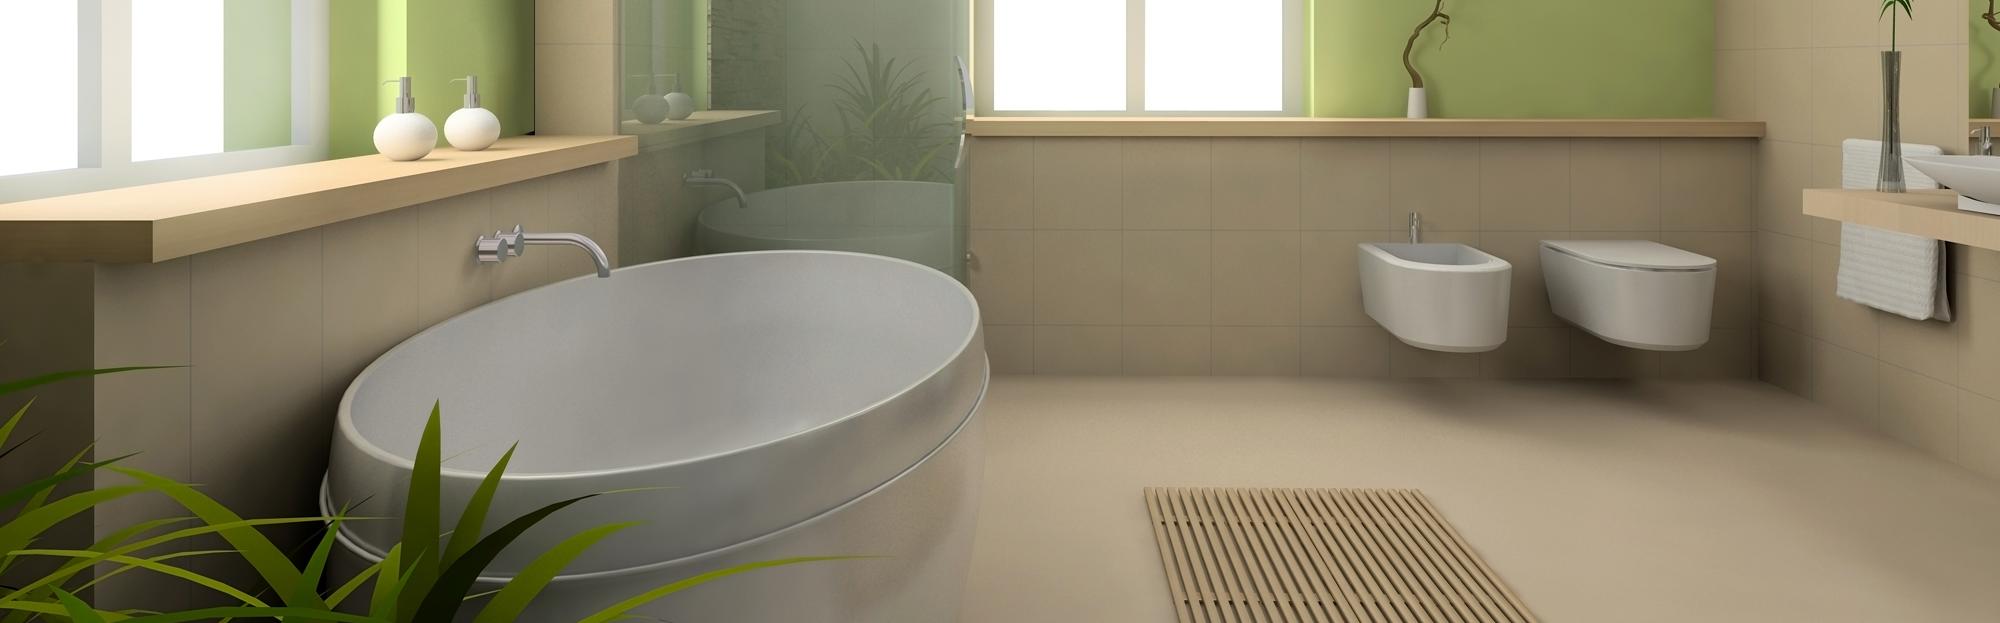 heizung sanit r solar m lheim an der ruhr oberhausen. Black Bedroom Furniture Sets. Home Design Ideas